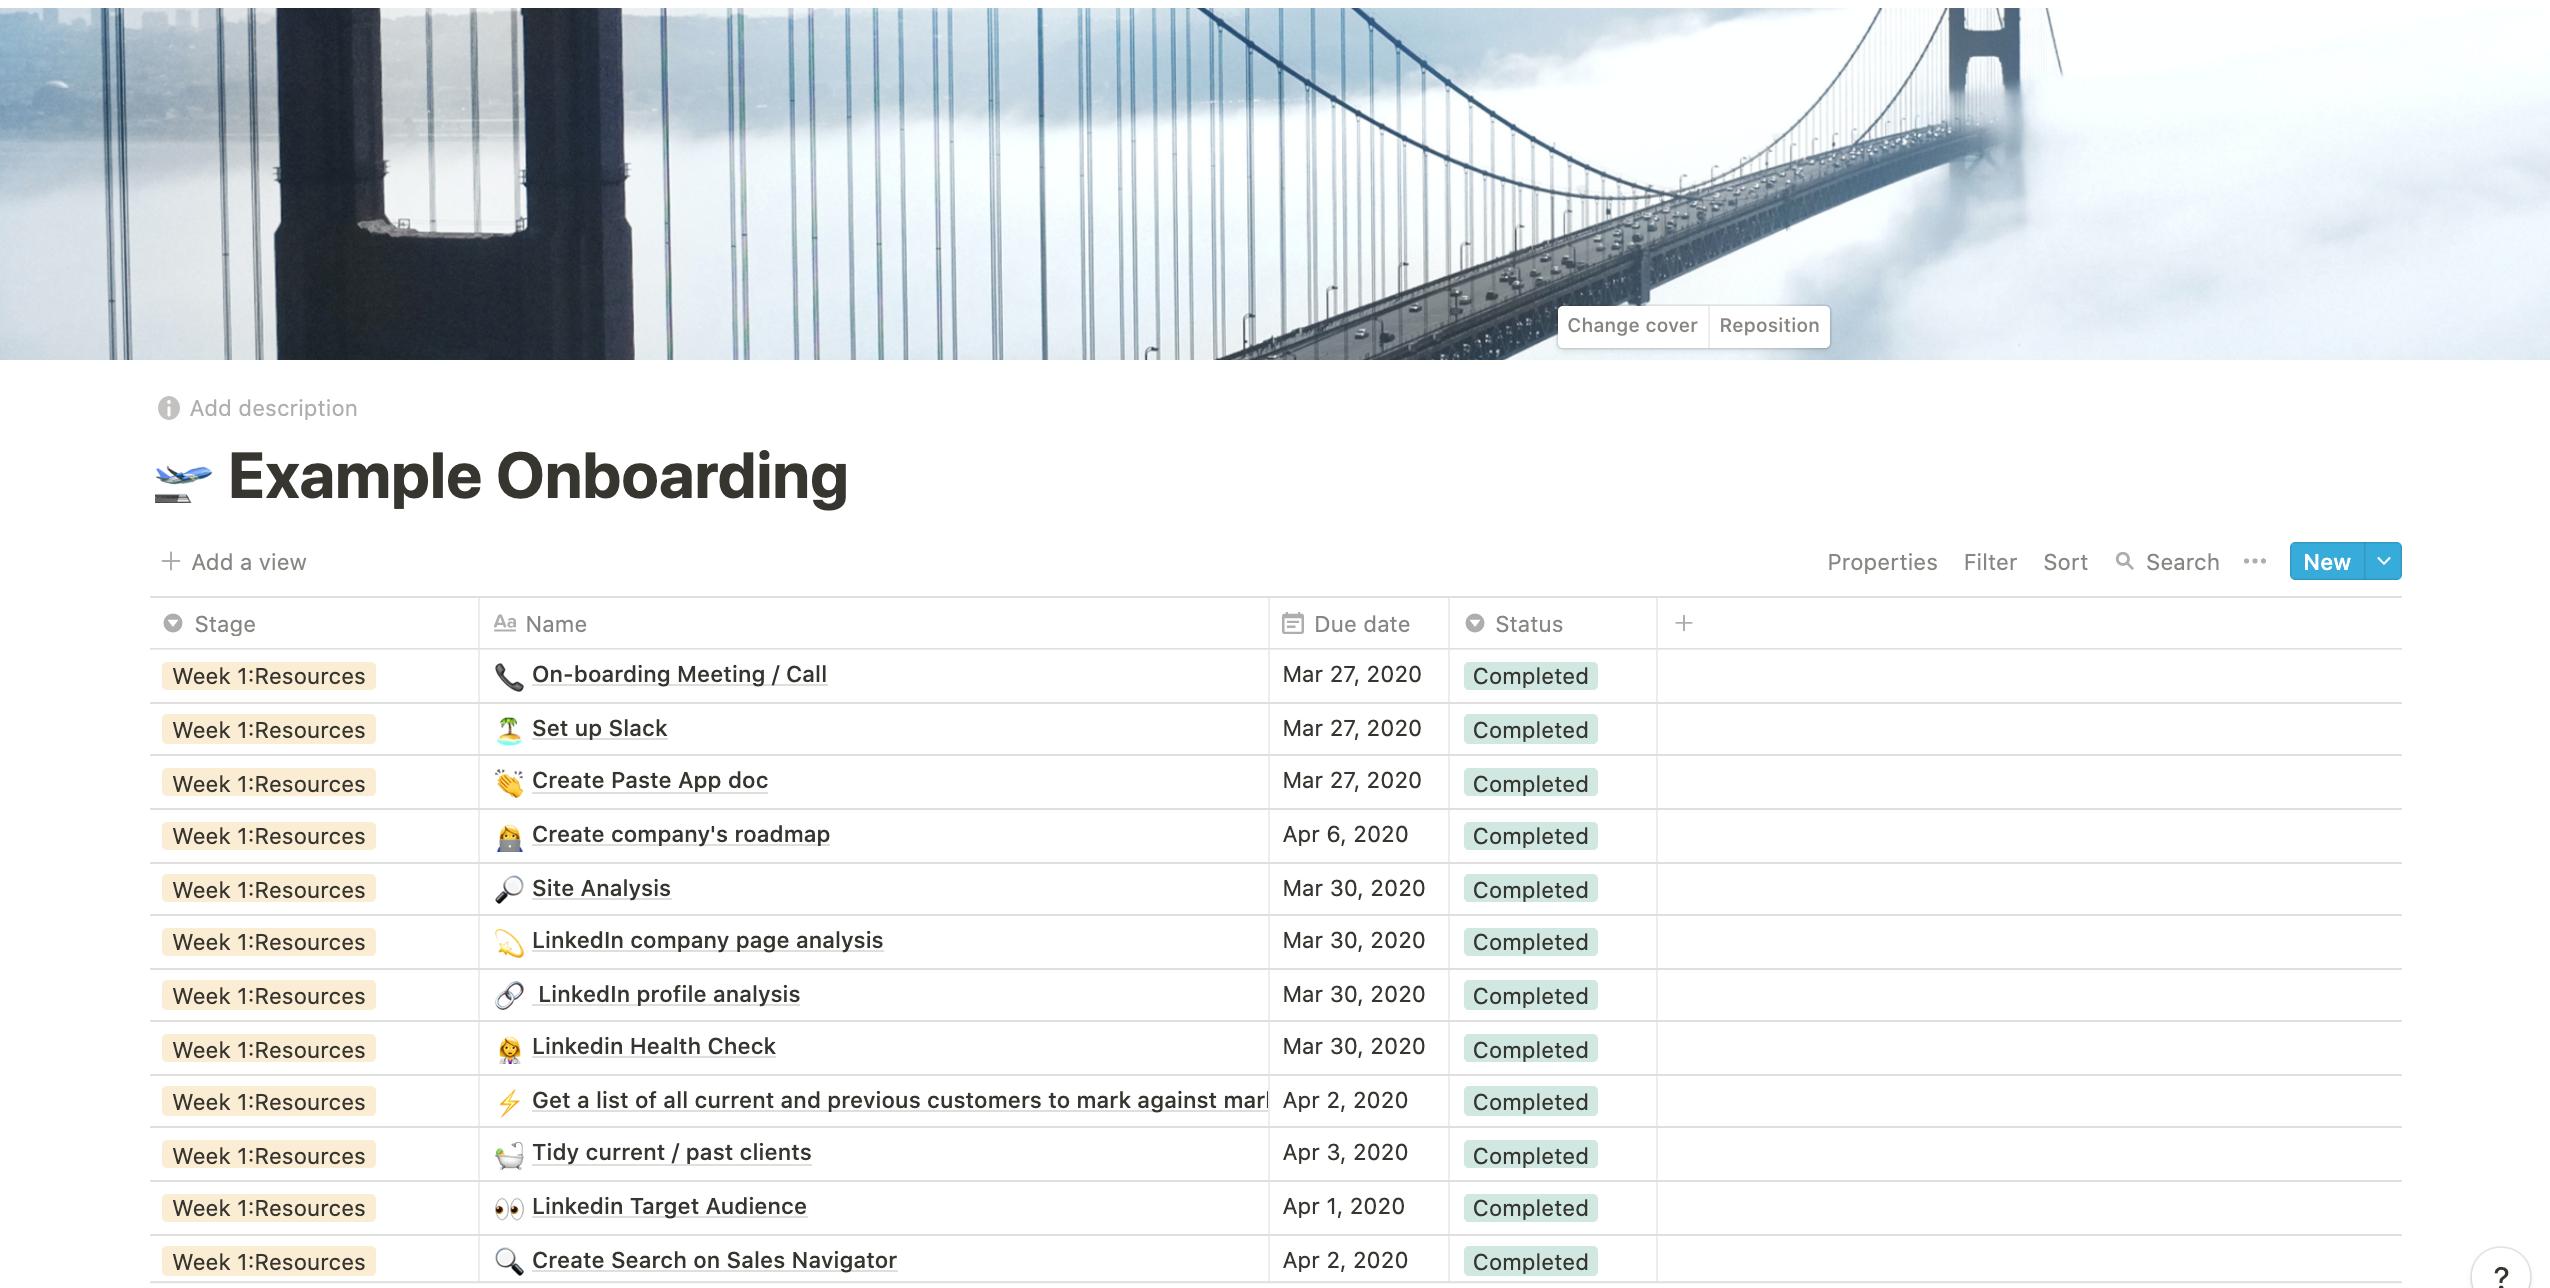 Example Onboarding